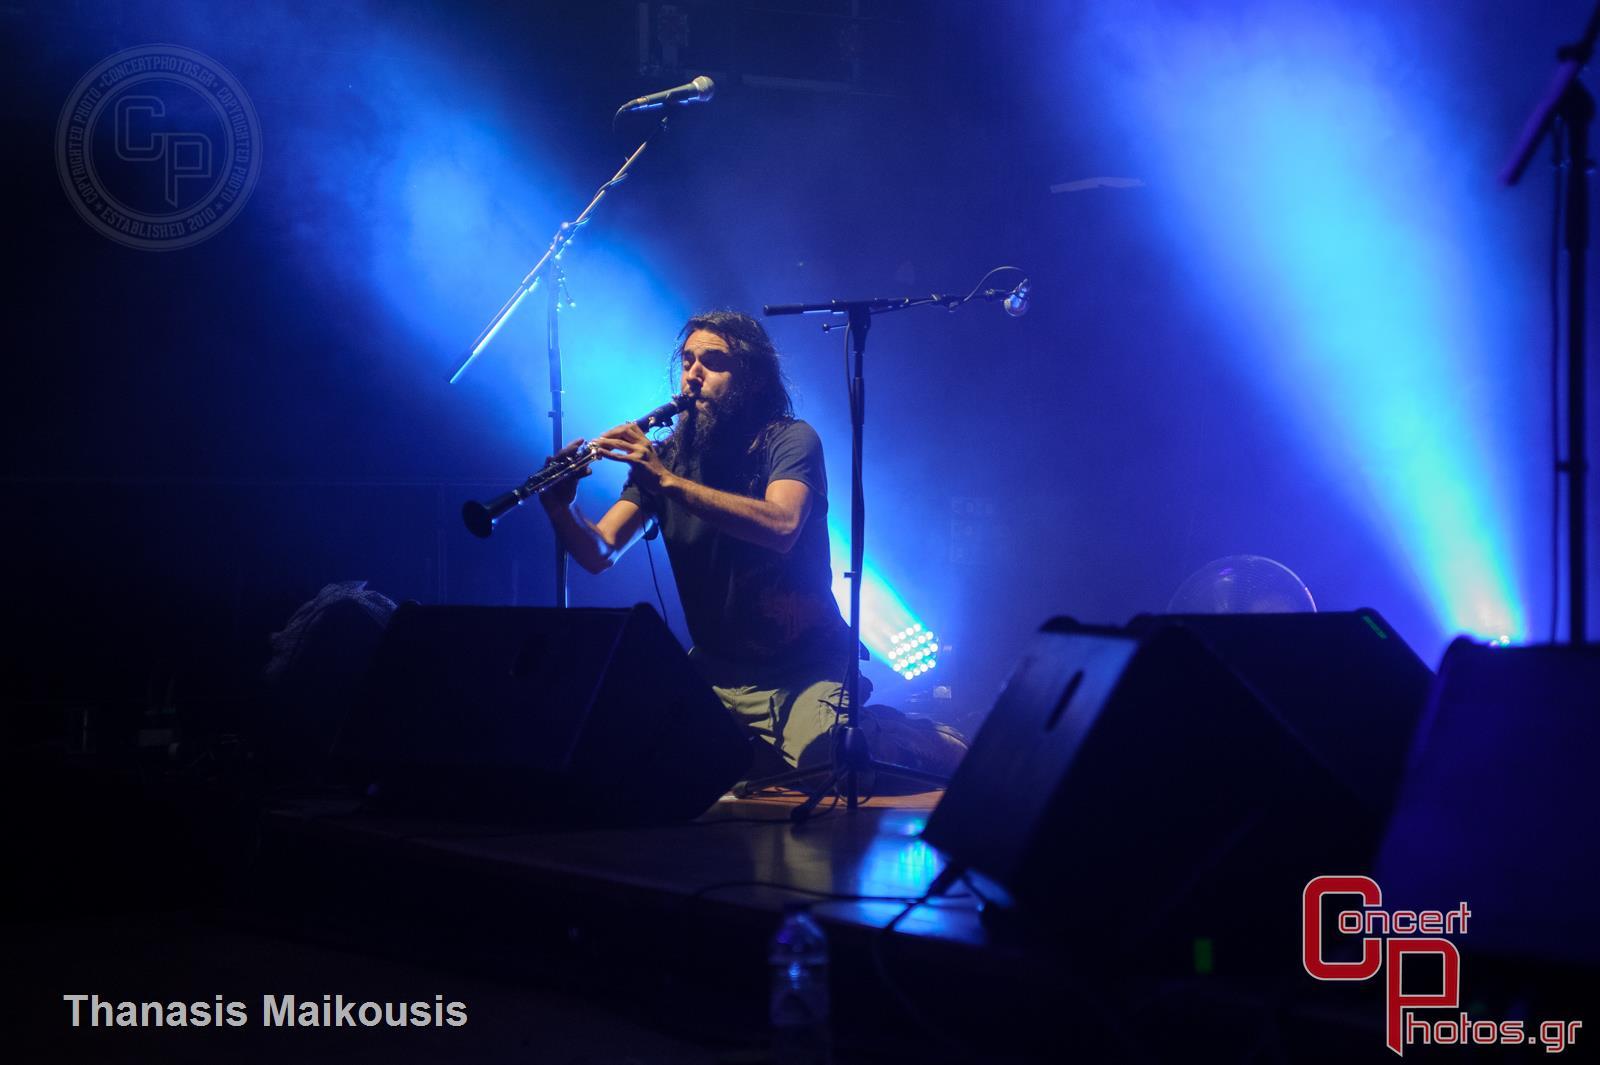 Villagers Of Ioannina City (V.I.C.) & Smallman-Villagers Of Ioannina City (V.I.C.) Smallman photographer: Thanasis Maikousis - concertphotos_20141116_01_15_14